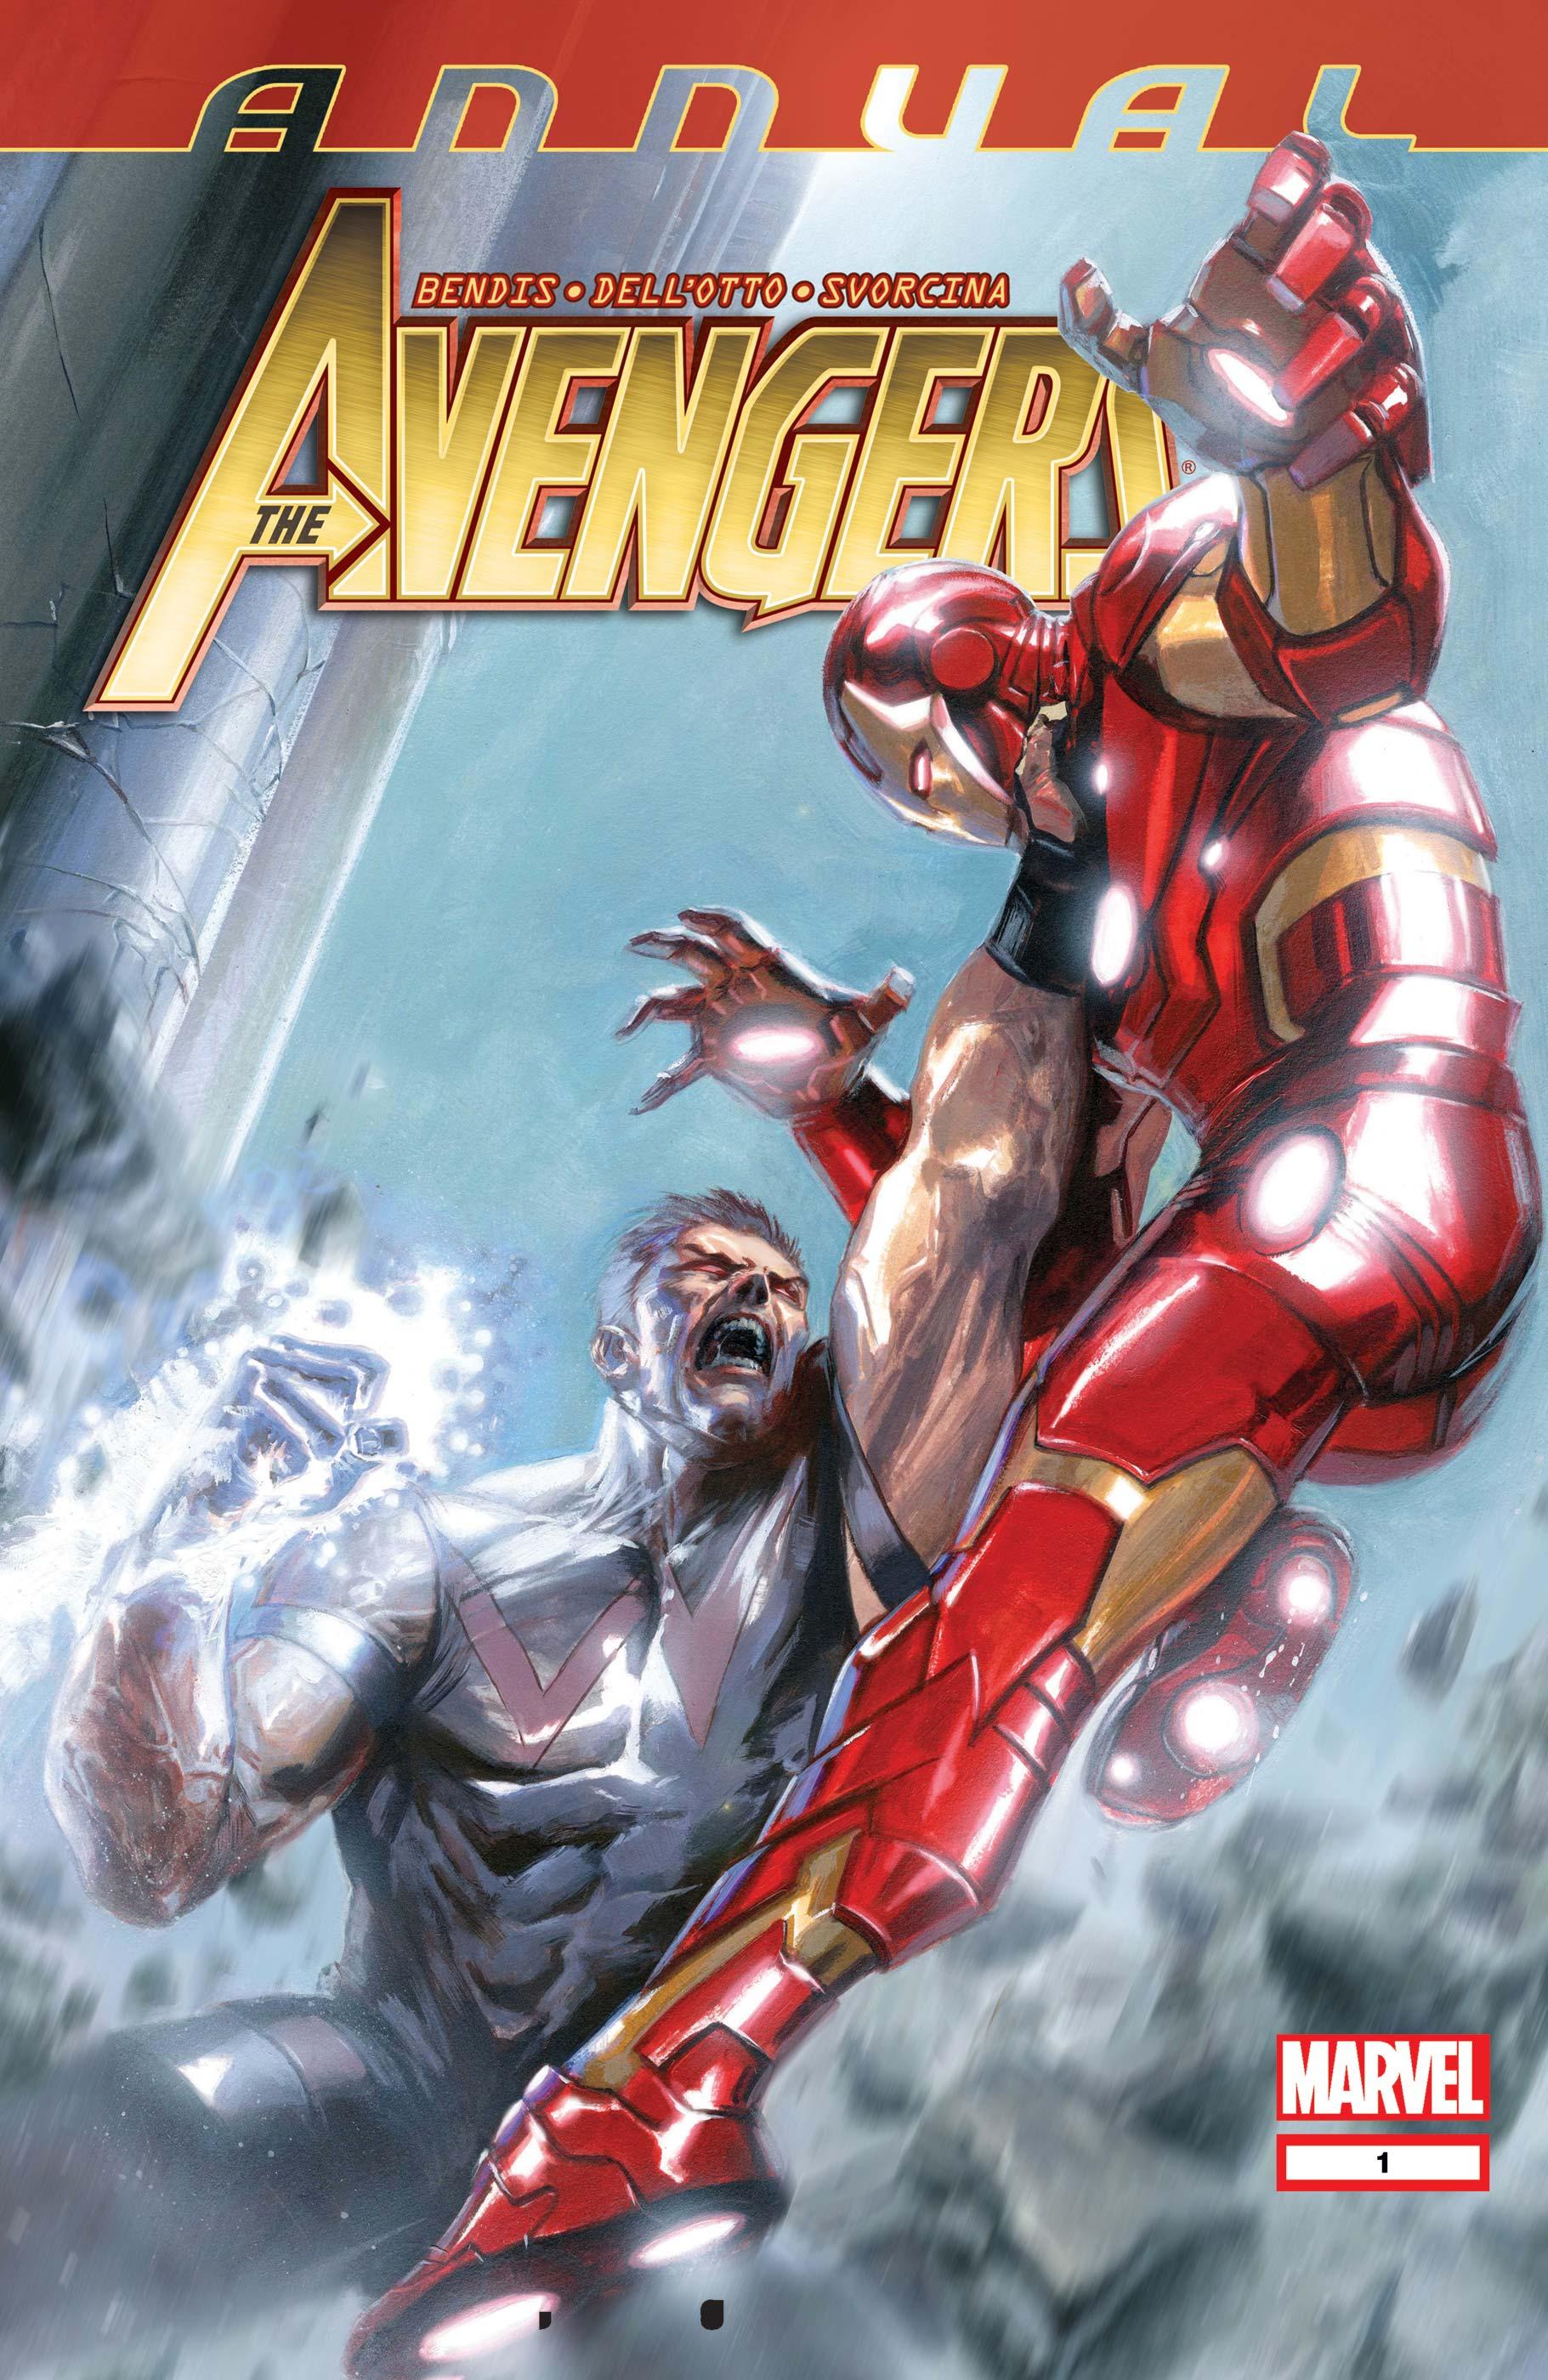 Avengers Annual (2012) #1